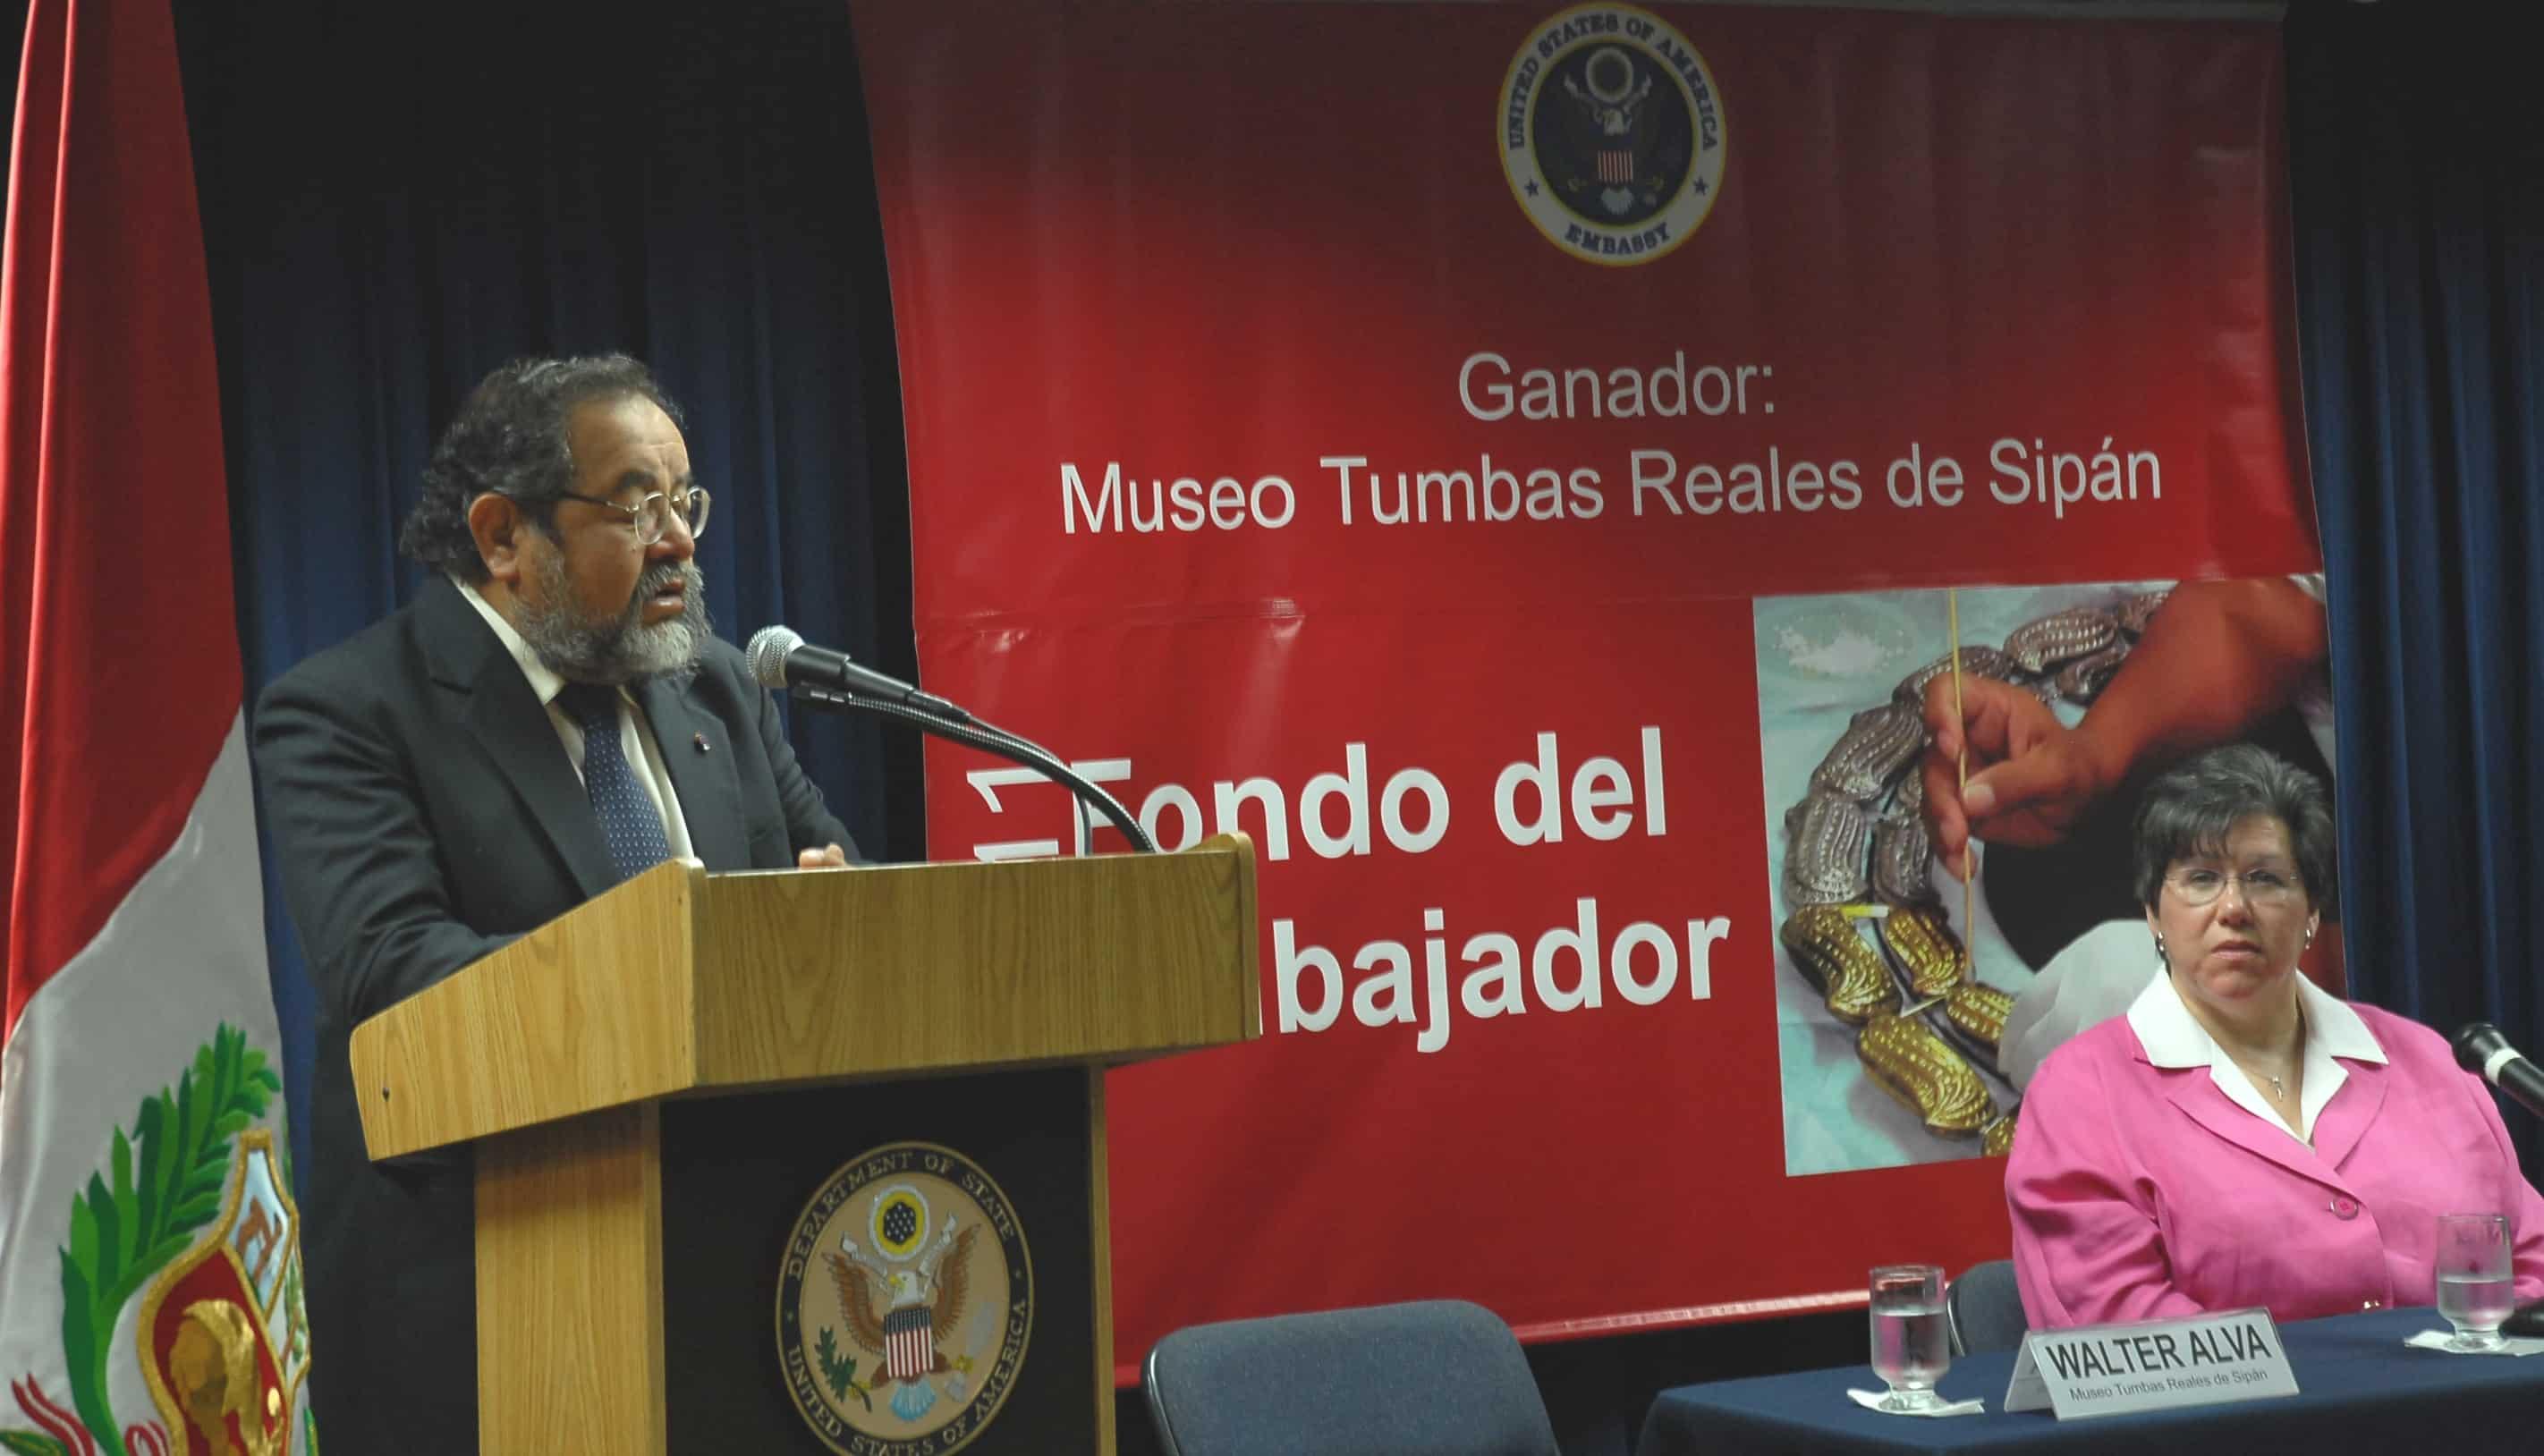 Walter Alva speaking at the US embassy in Peru in 2011.